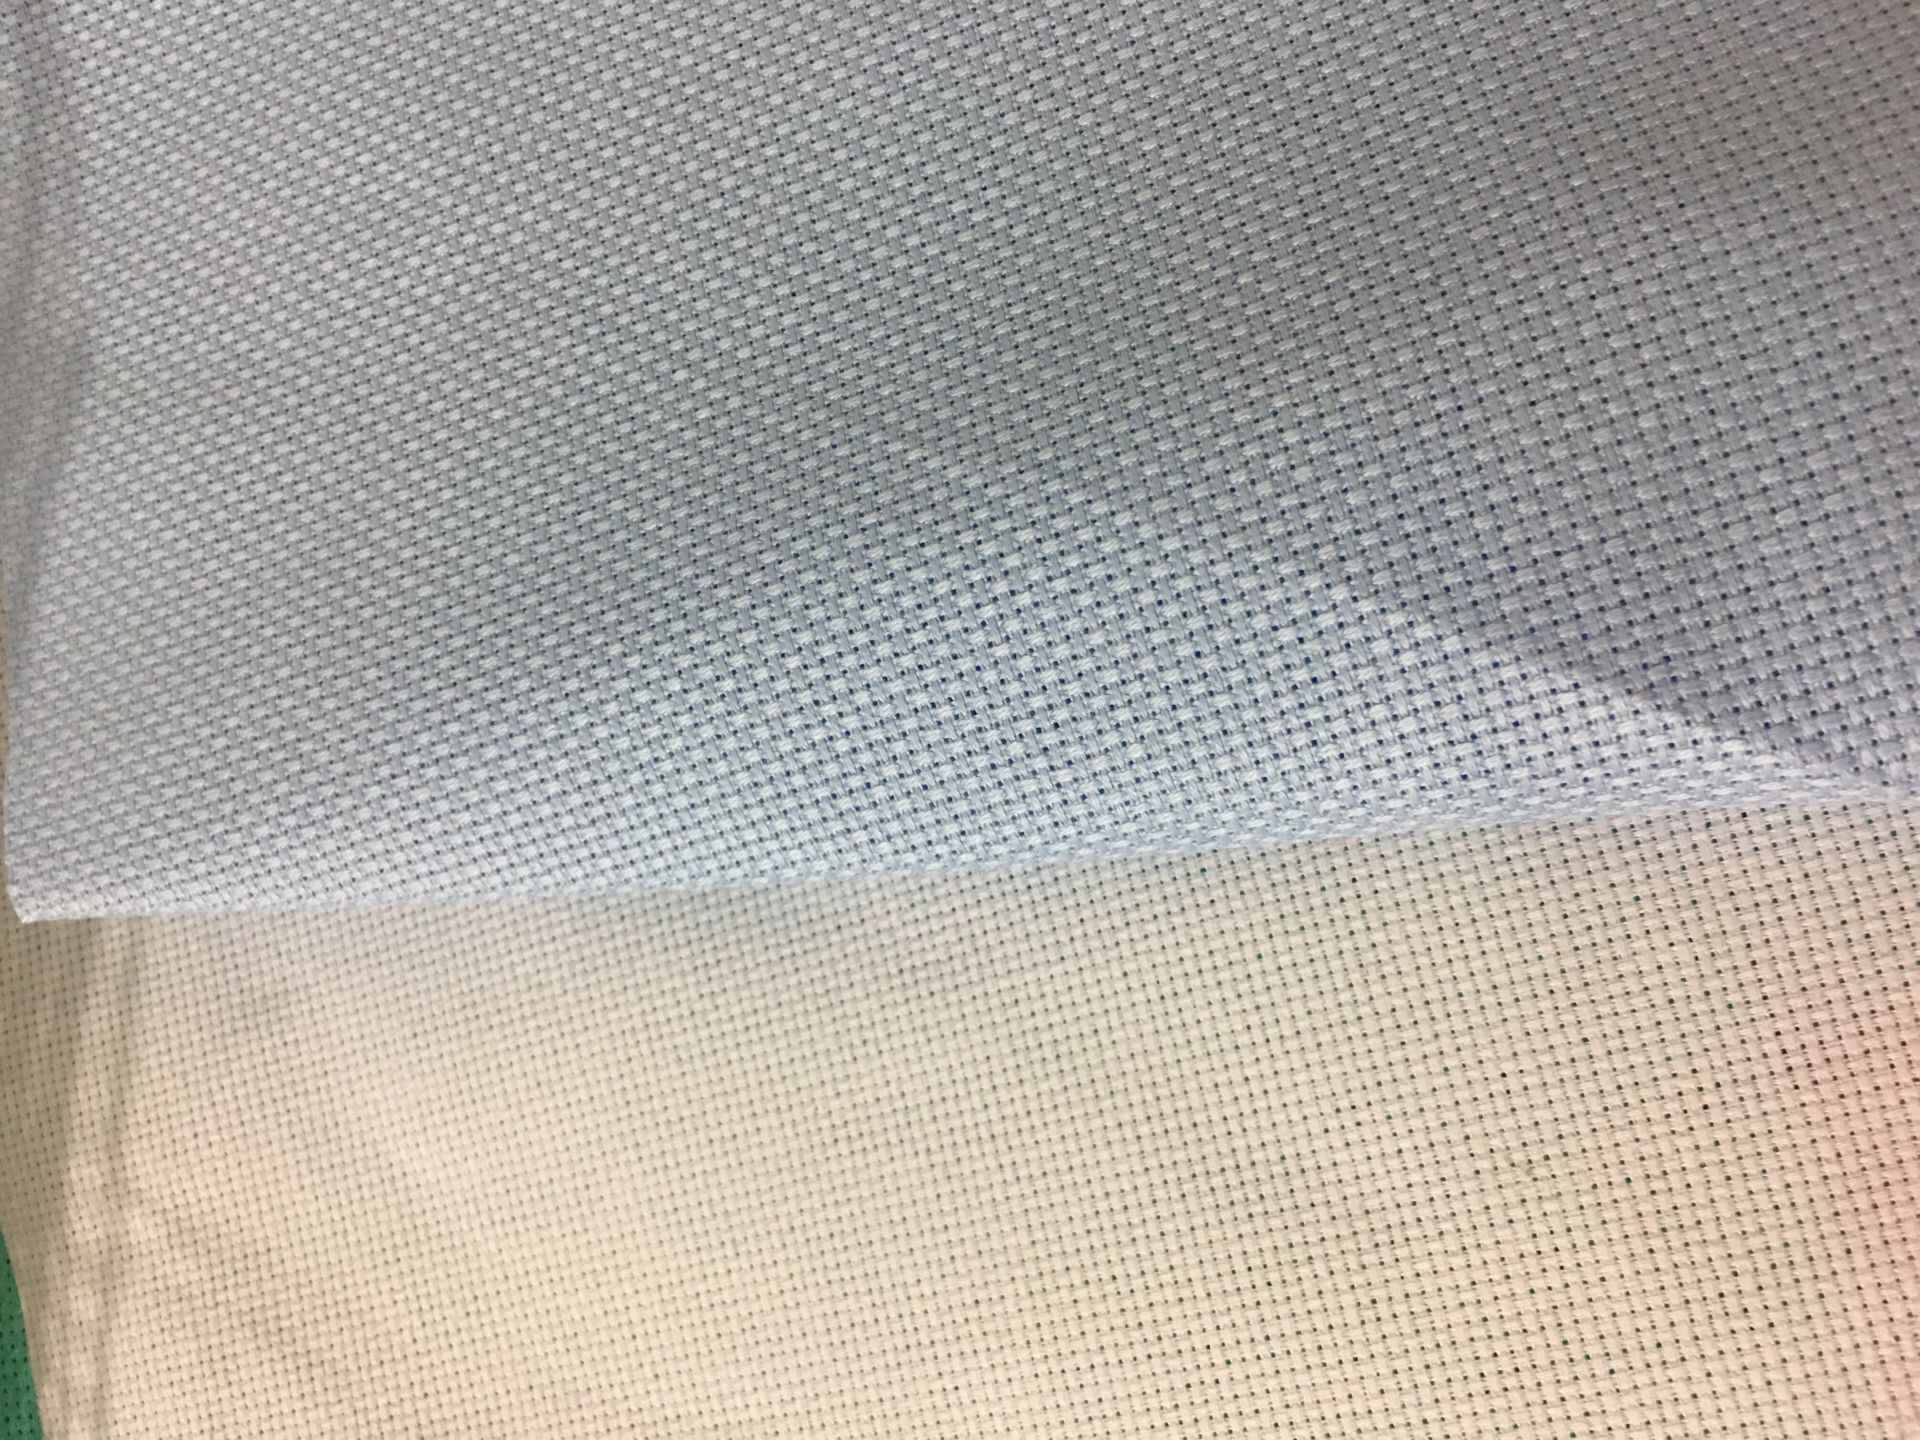 Oneroom tissu à point de croix vert, taille différente, tissu blanc, rose, flaxen, tissu à point de croix vert